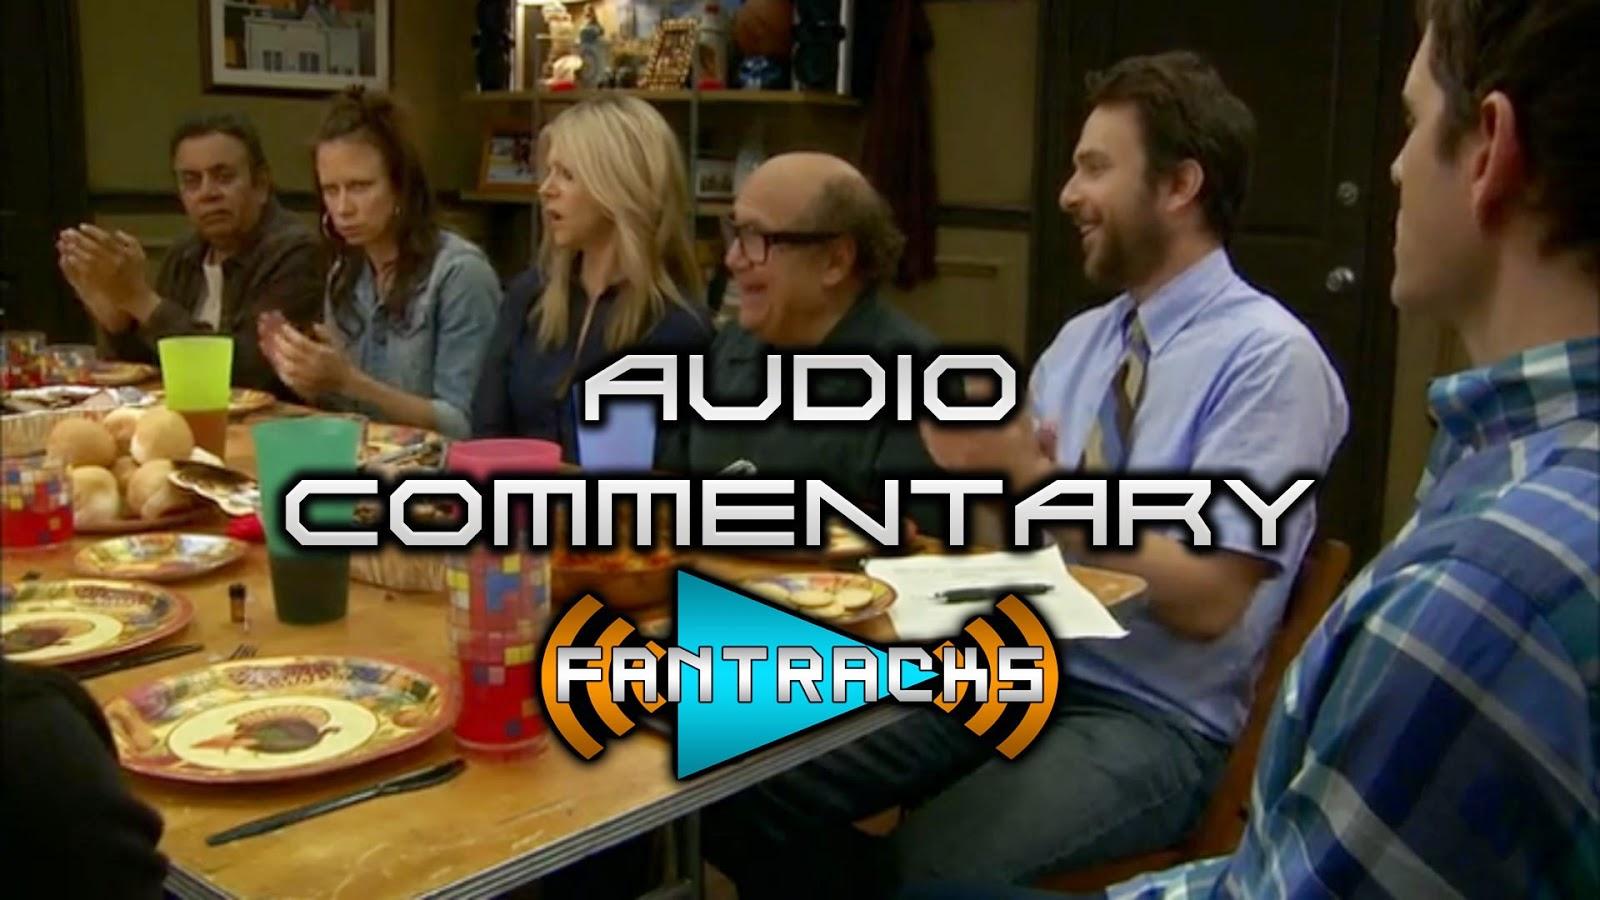 FanTracks It's Always Sunny in Philadelphia audio commentary